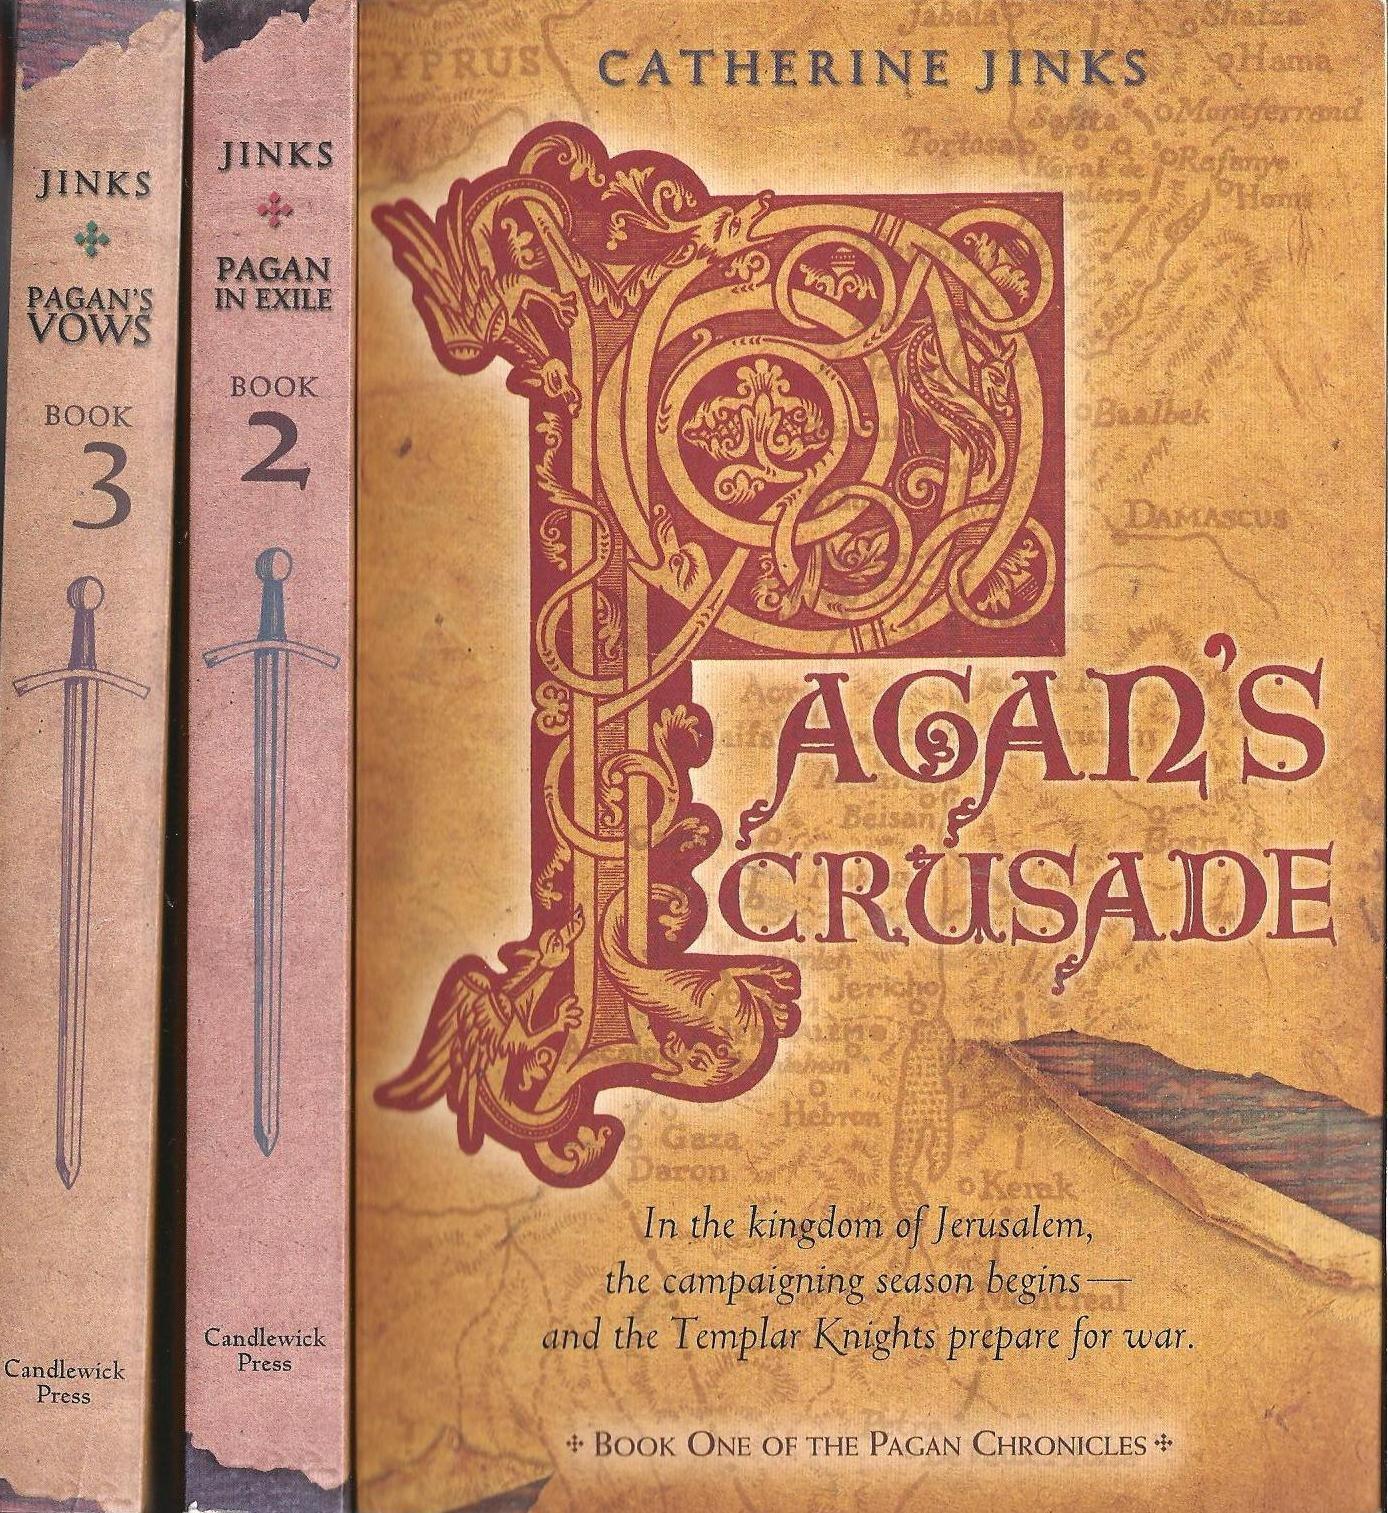 The Pagan Chronicles, Books 1-3 (Pagan's Crusade/Pagan in Exile/Pagan's Vows) pdf